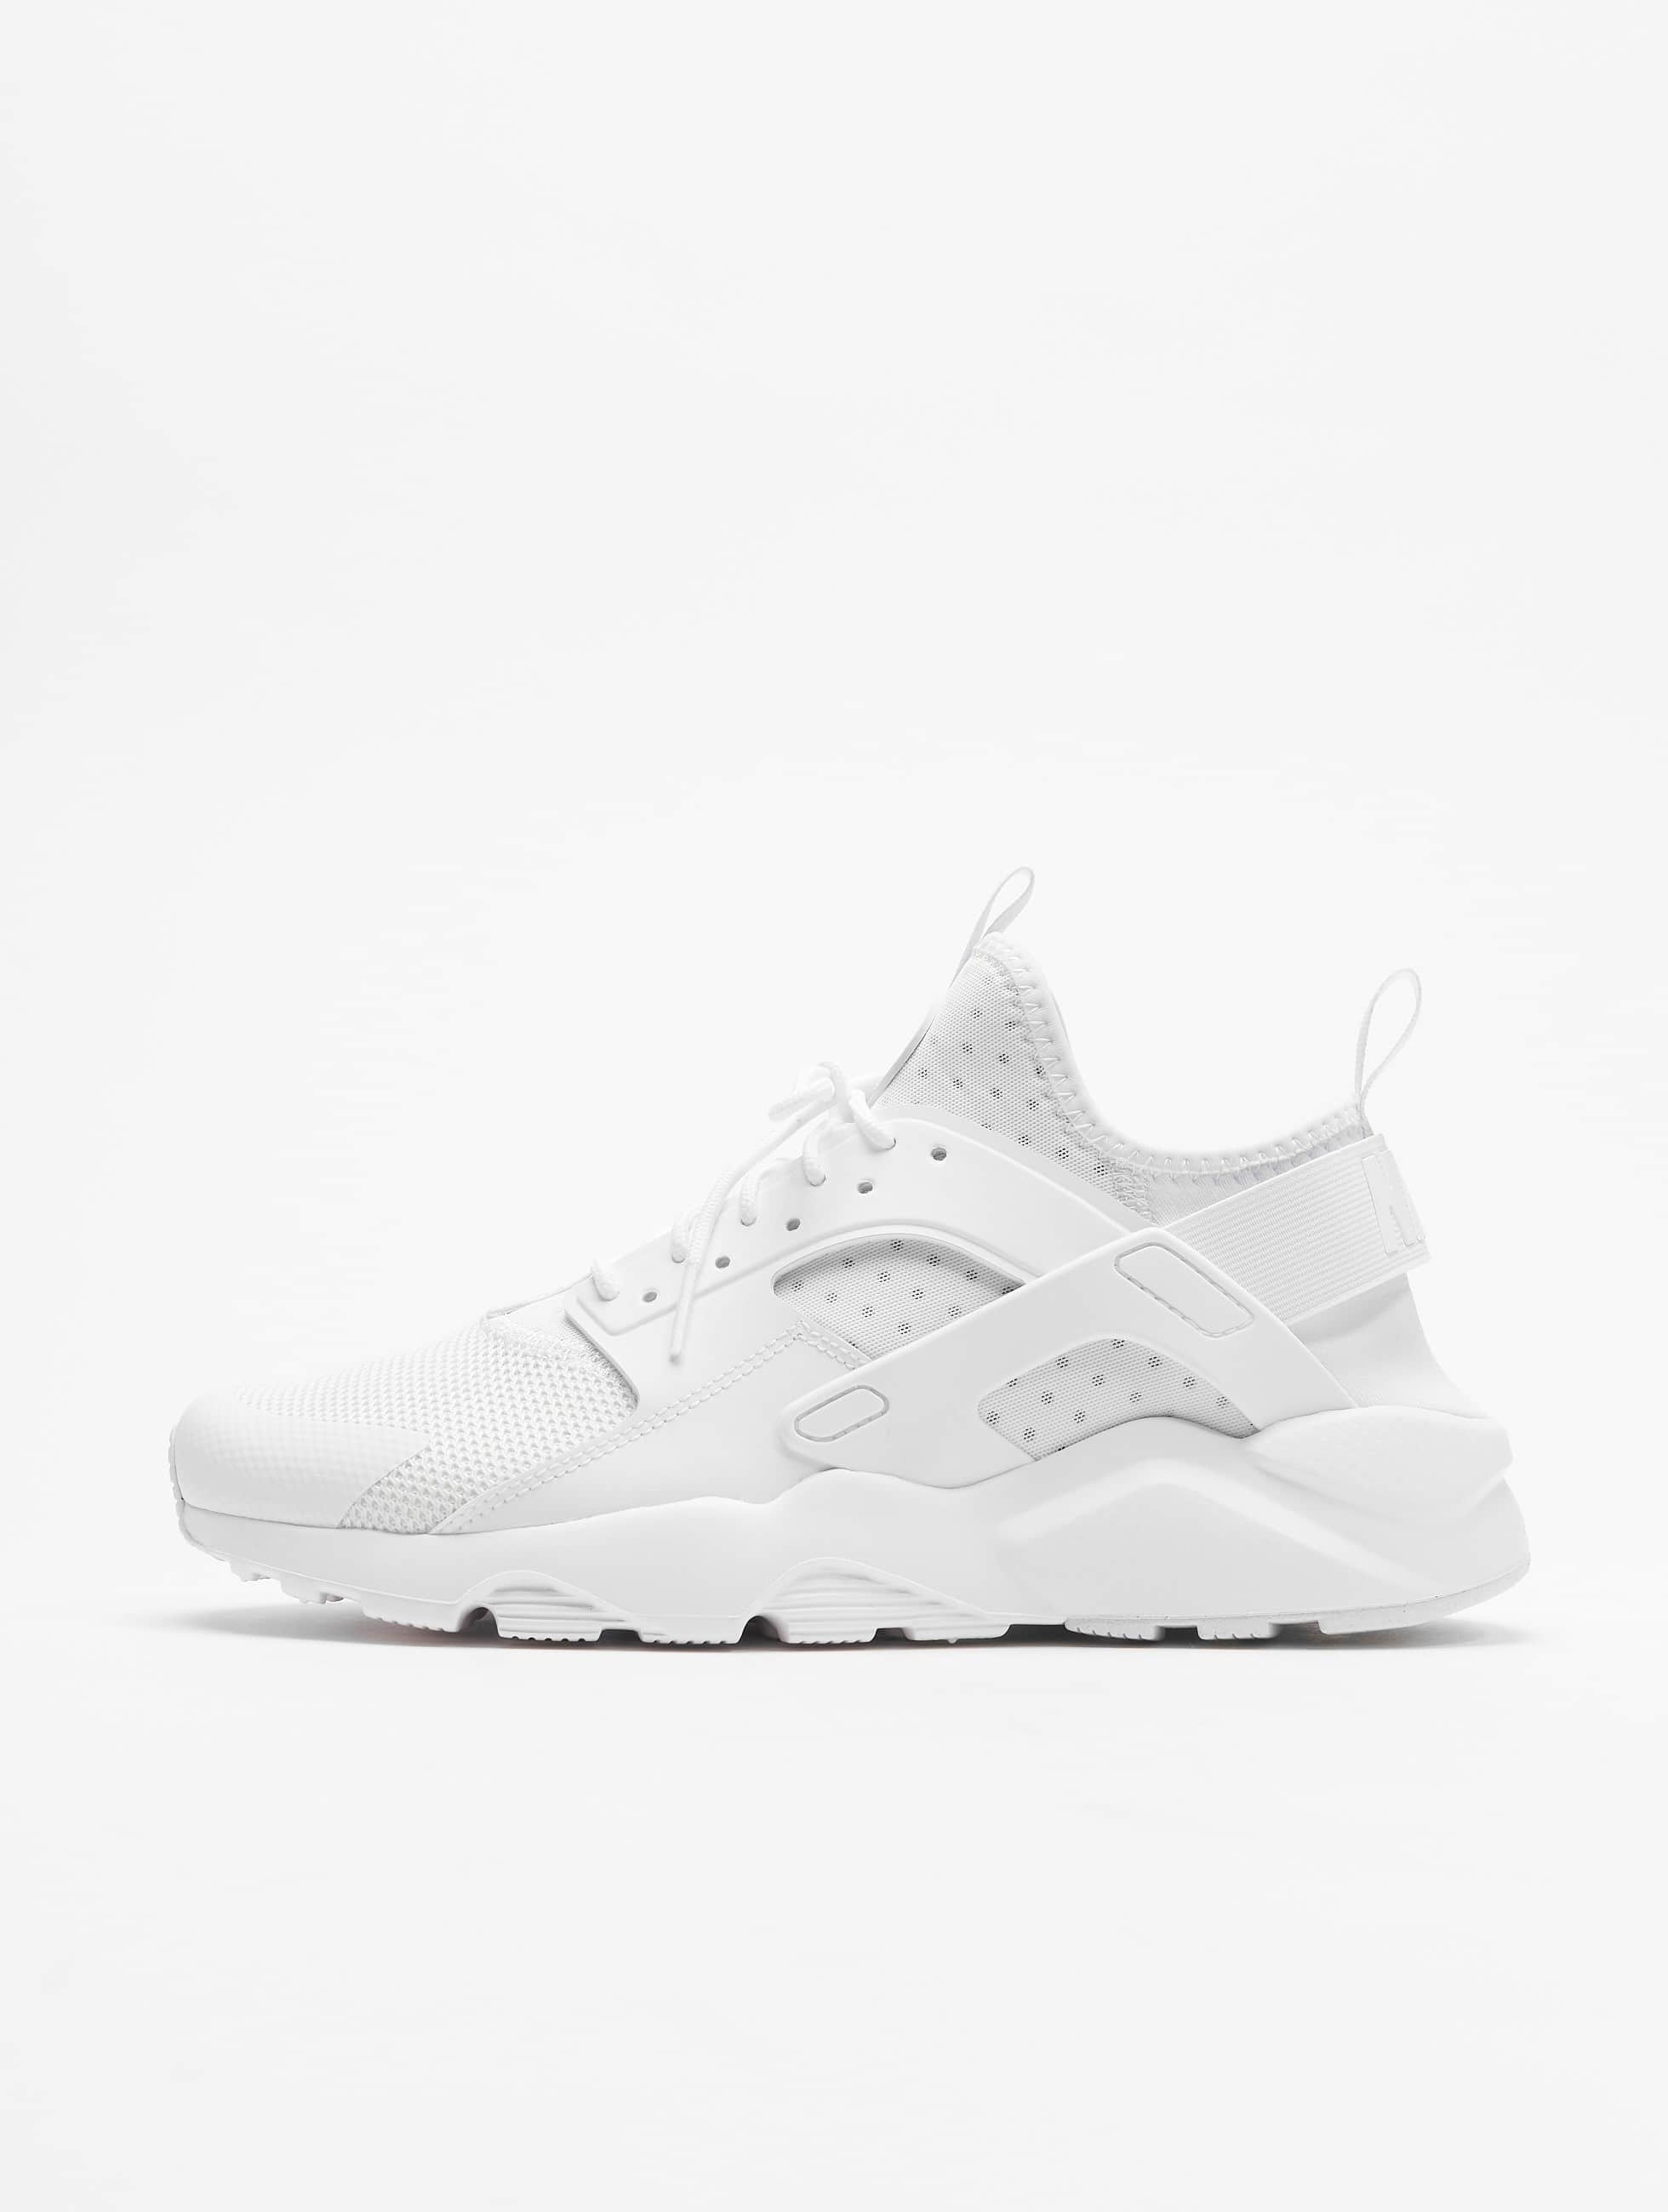 28281815798 Nike schoen / sneaker Air Huarache Run Ultra in wit 257058